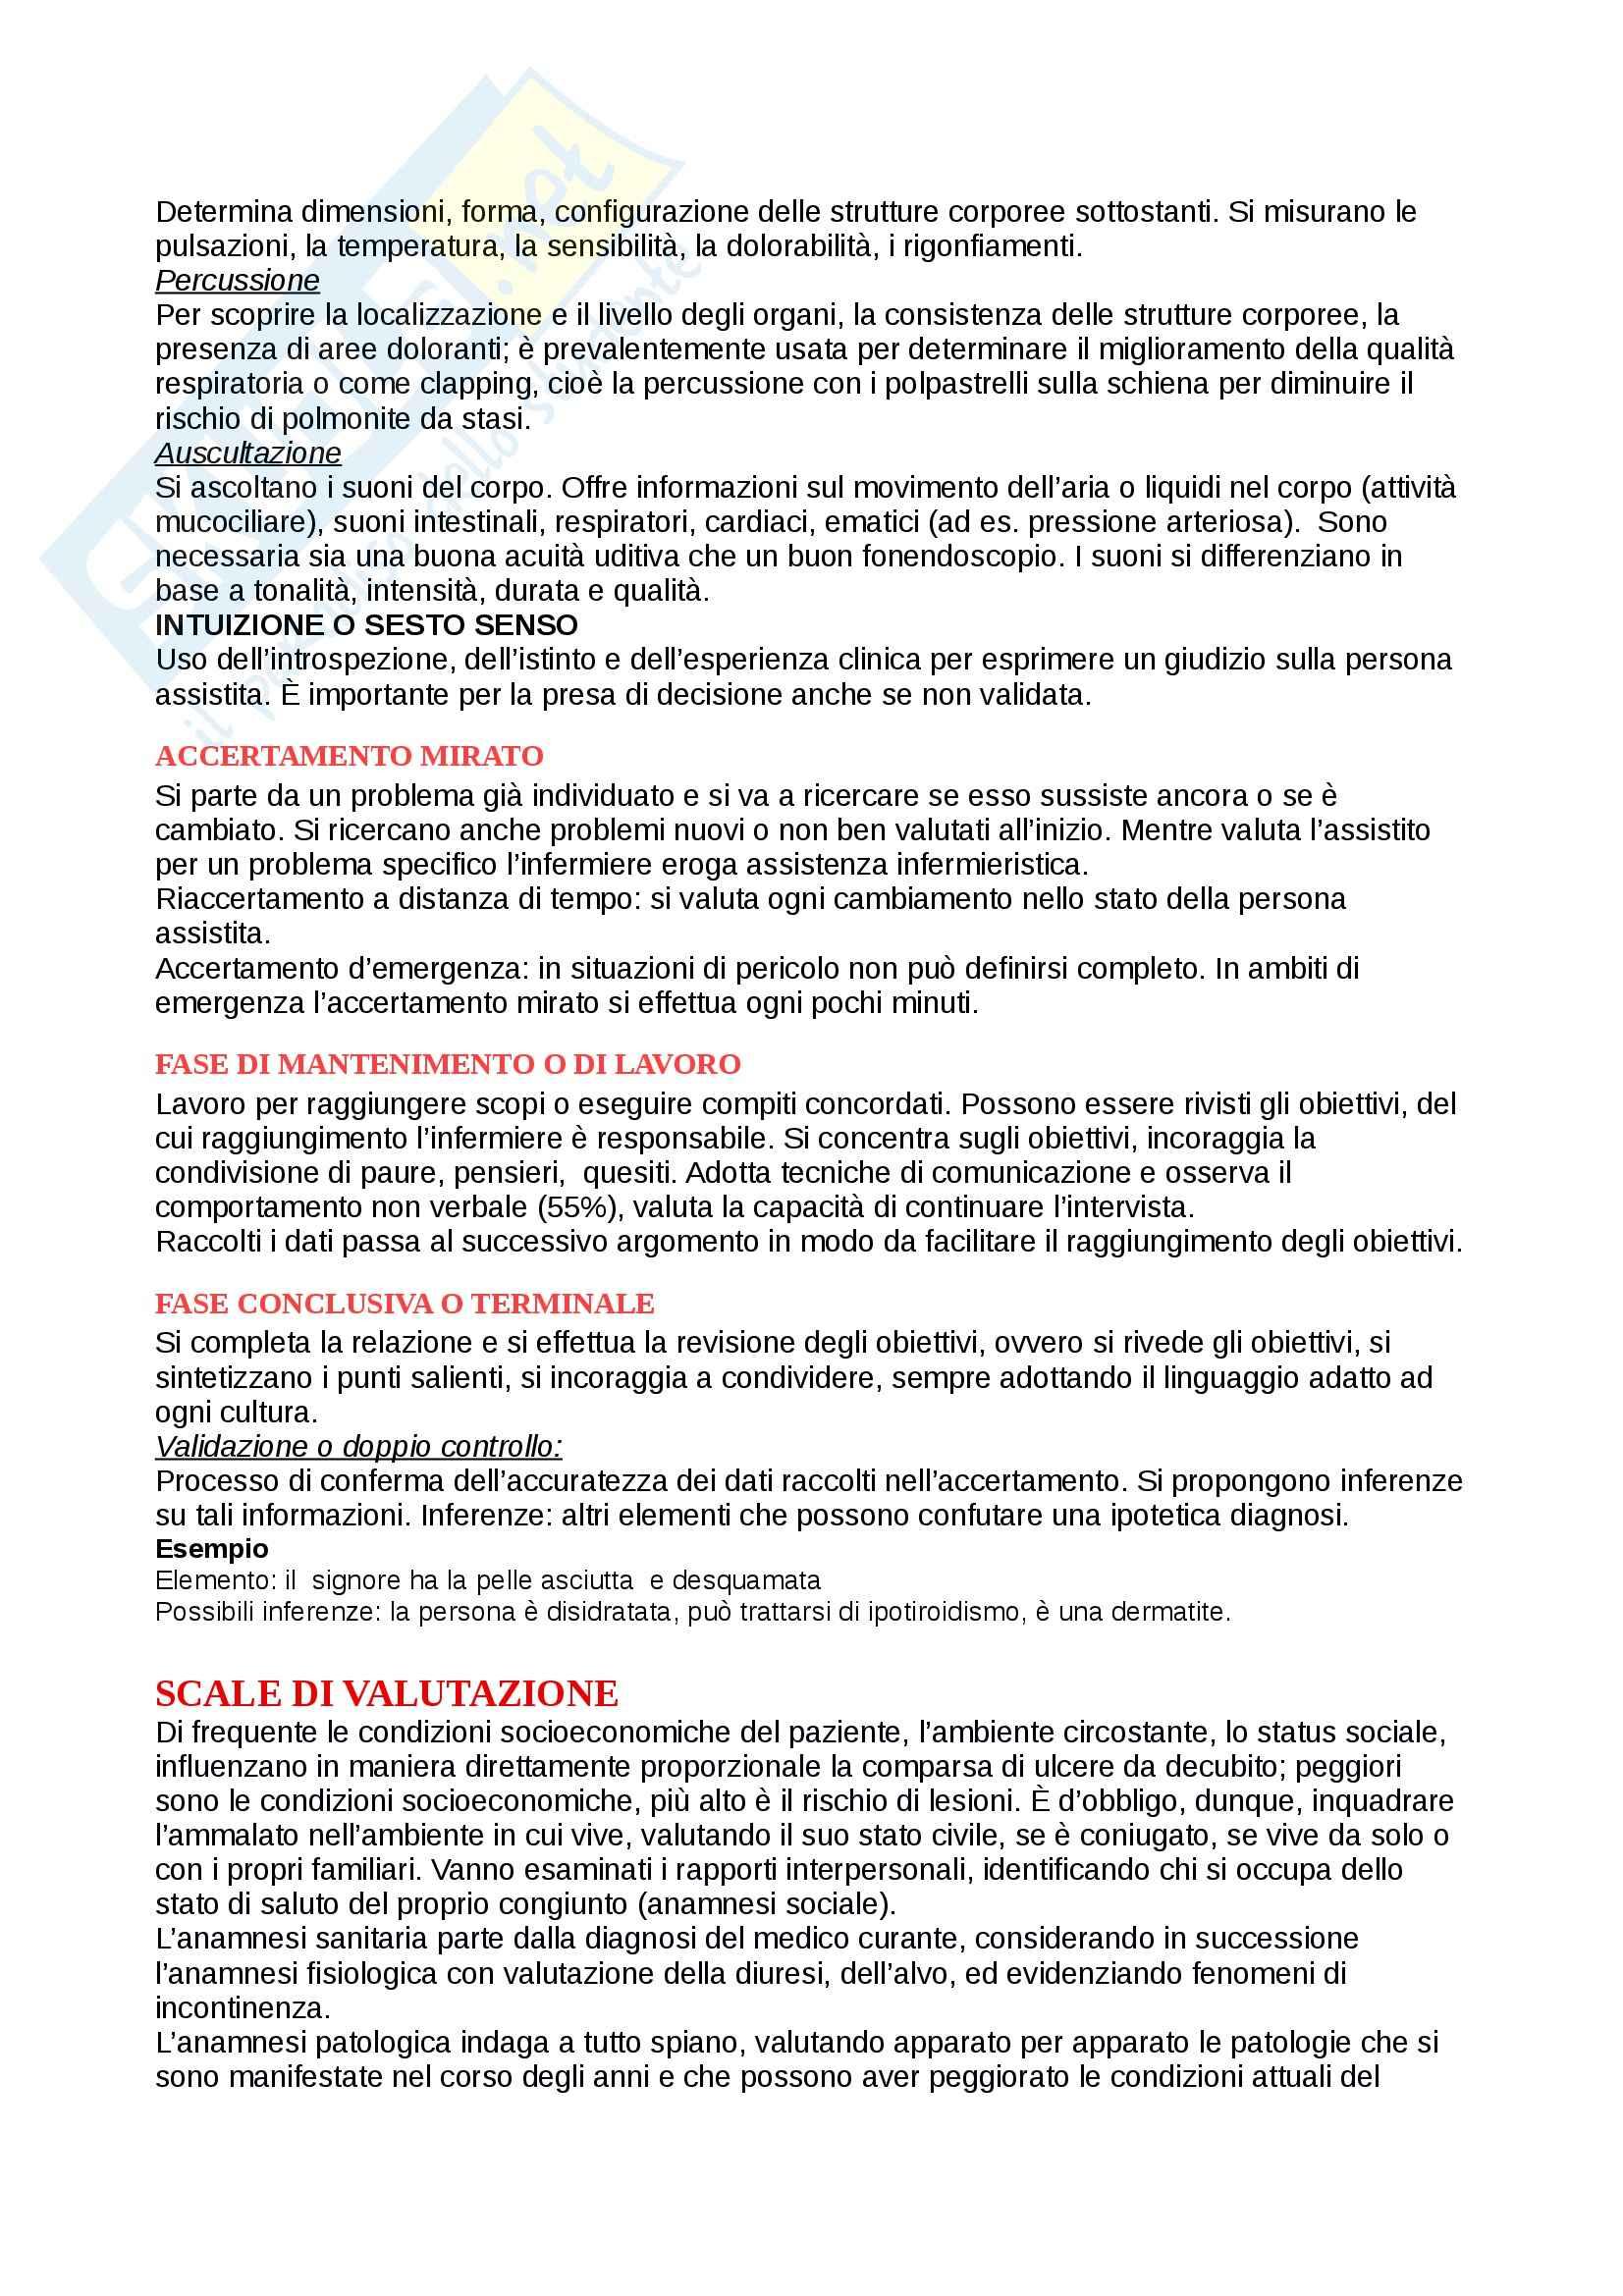 Infermieristica - infermieristica in area medica Pag. 6